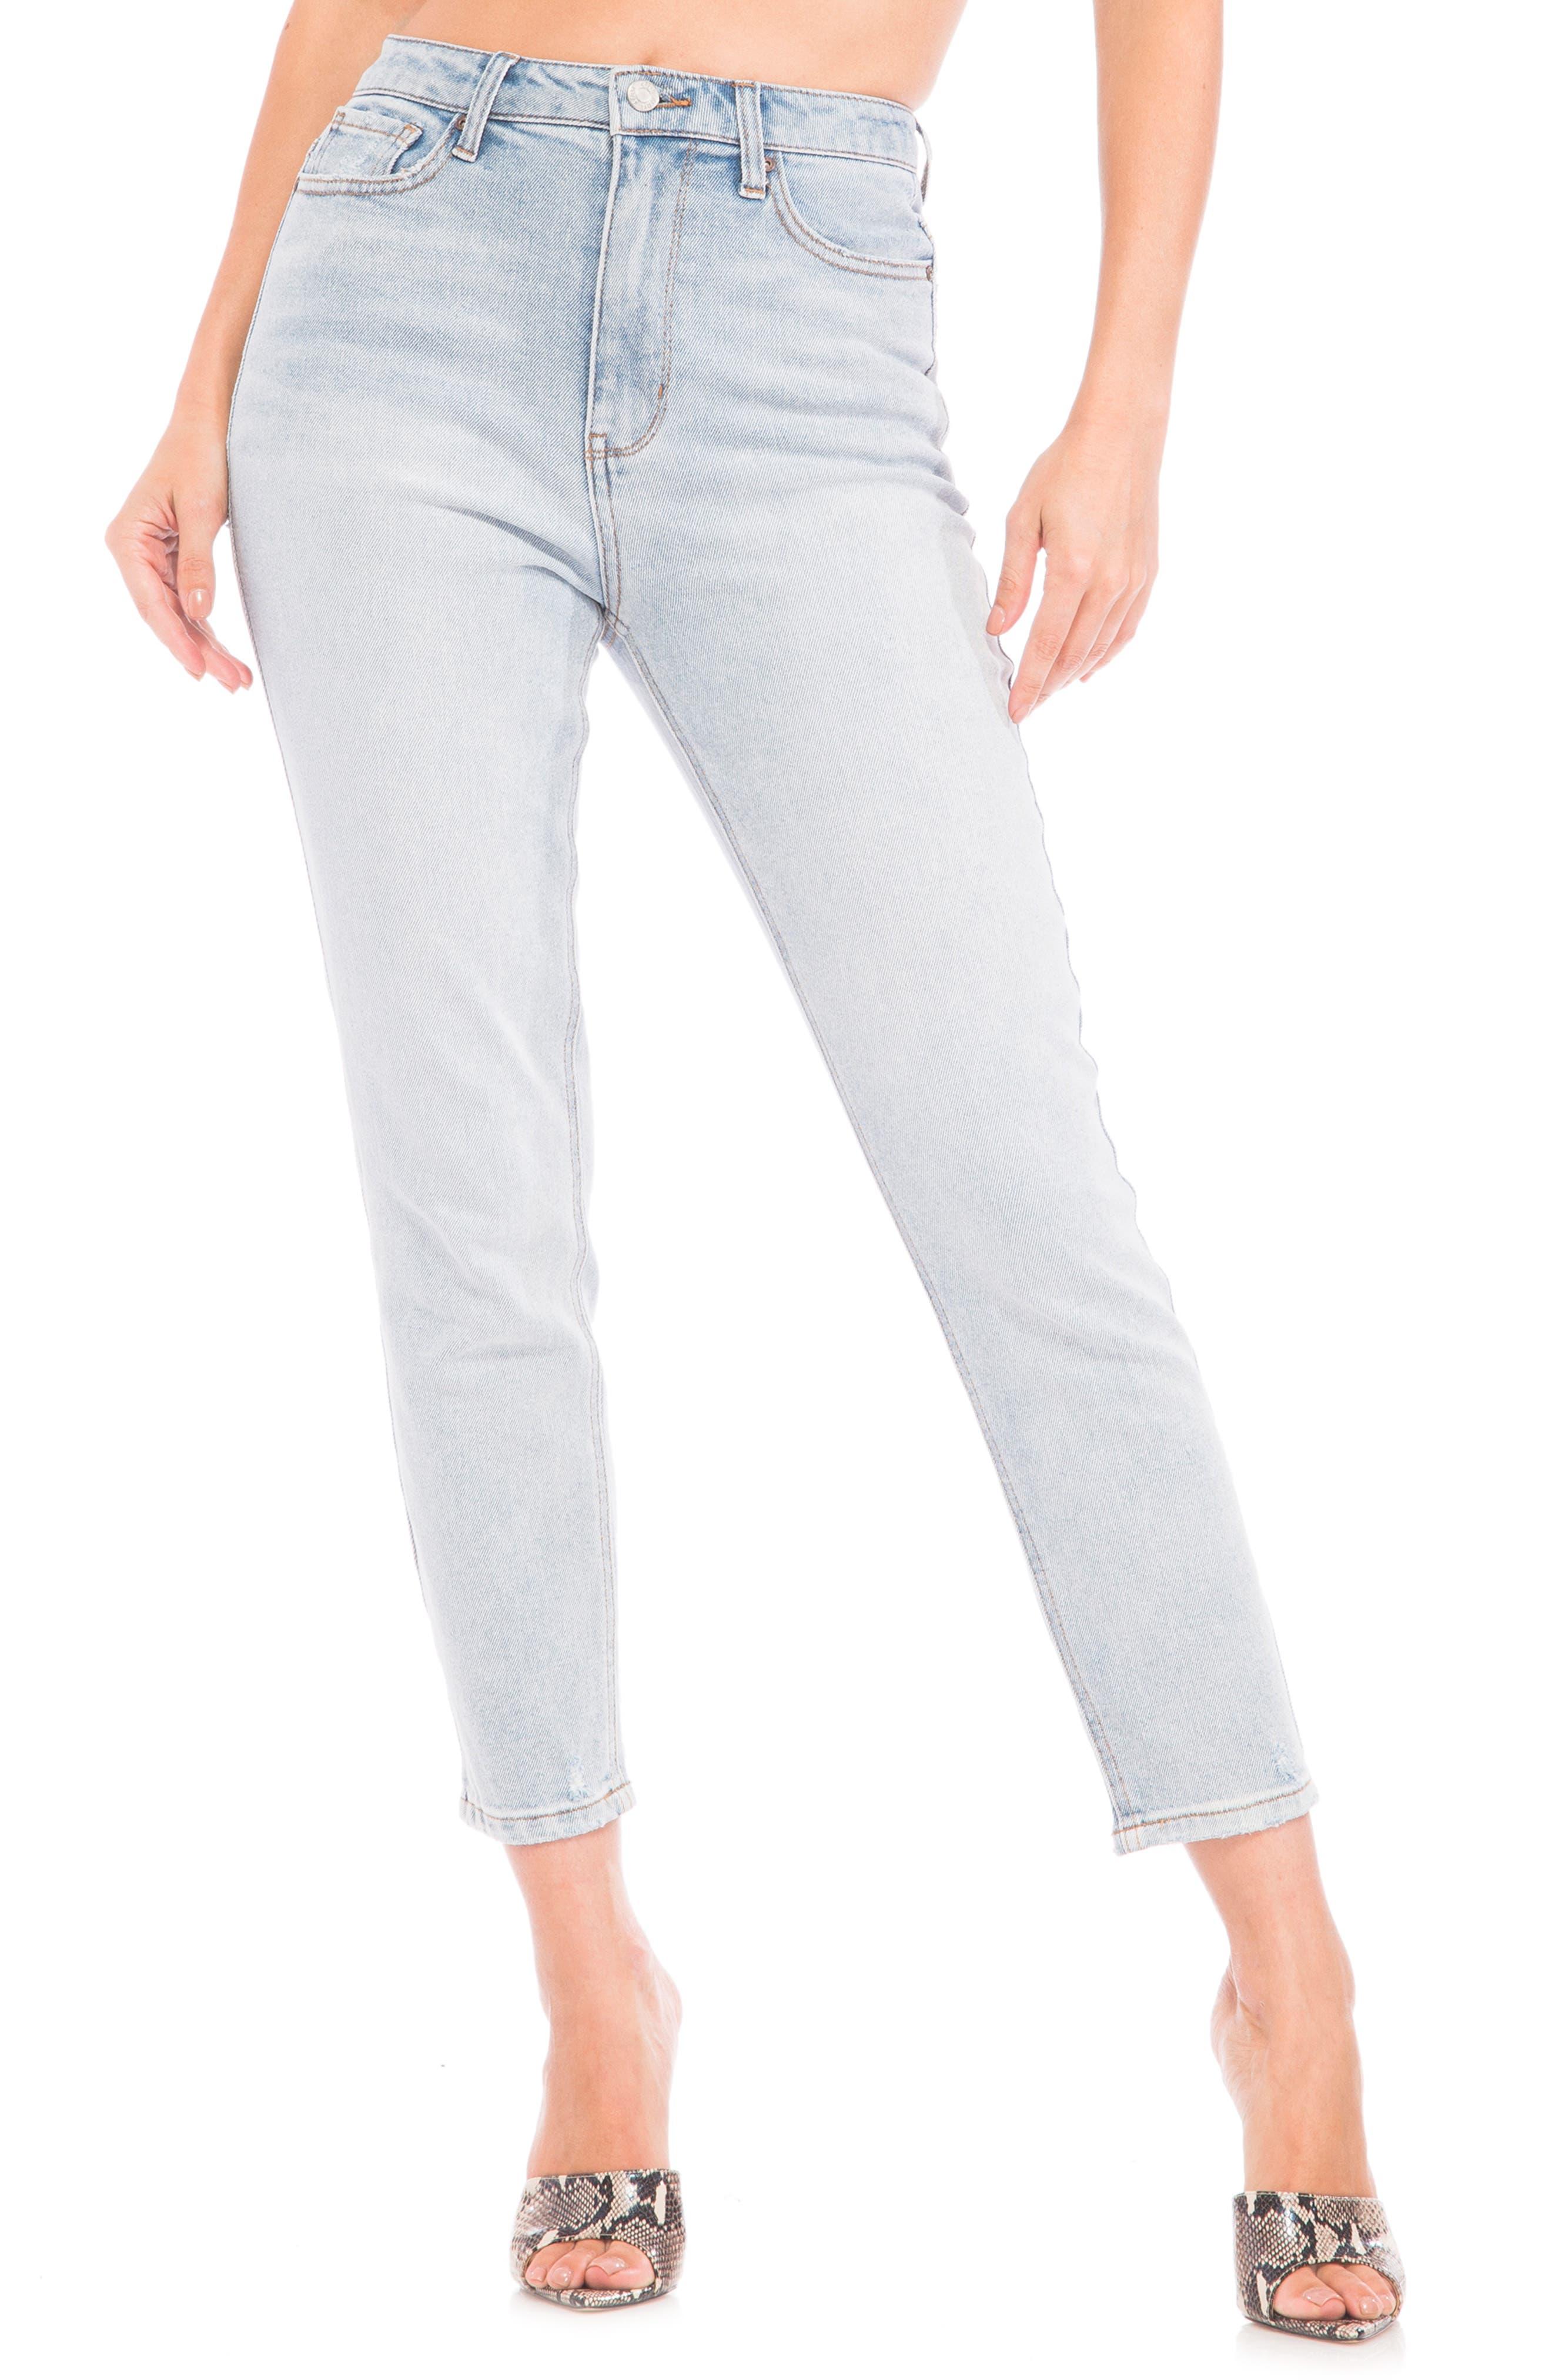 Ferris High Waist Slim Mom Jeans